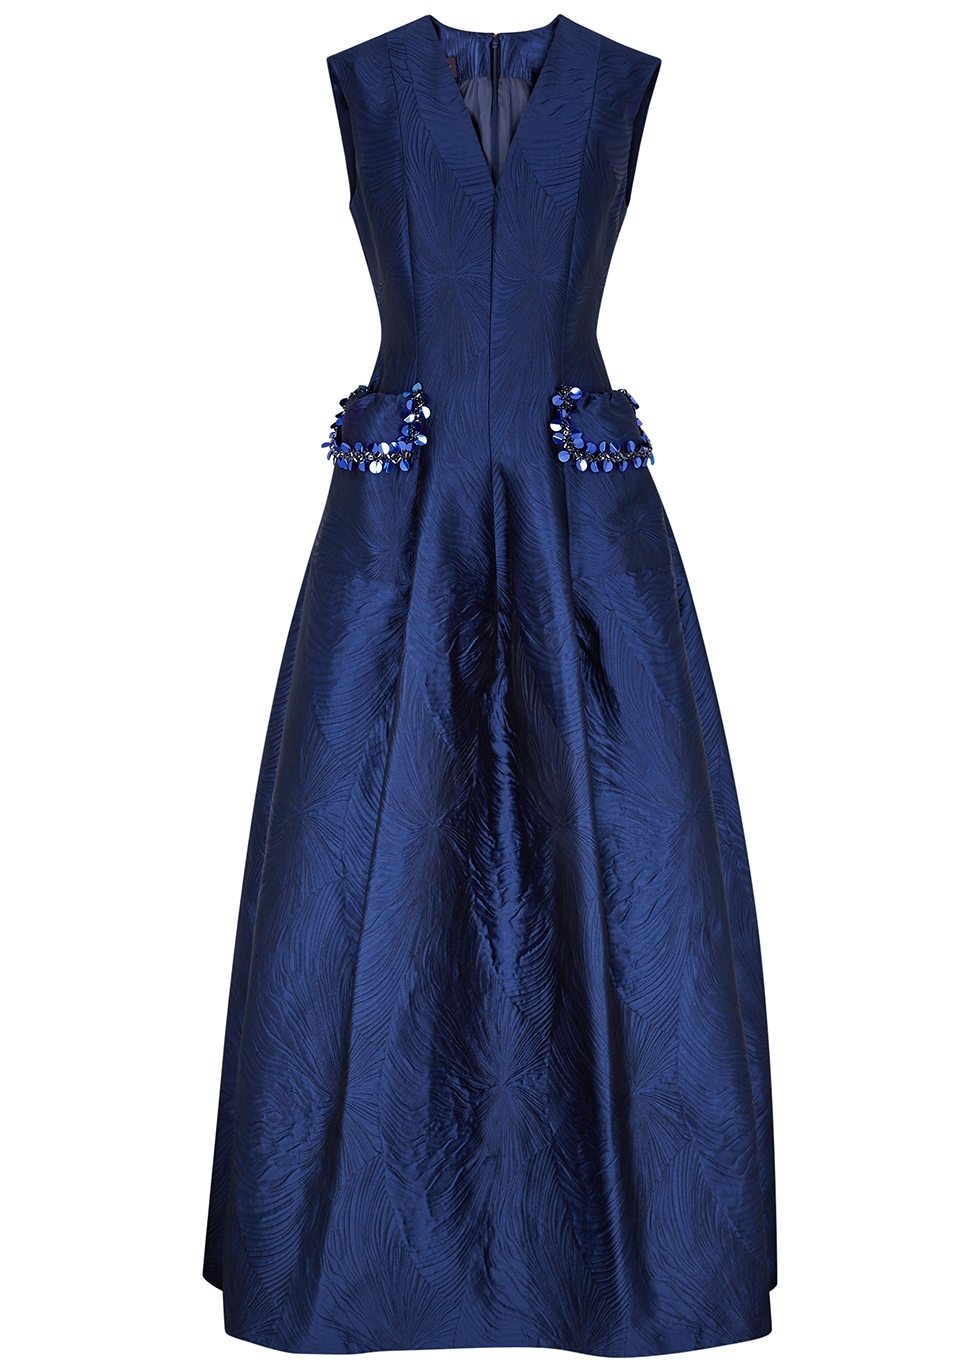 Momo navy embellished jacquard gown